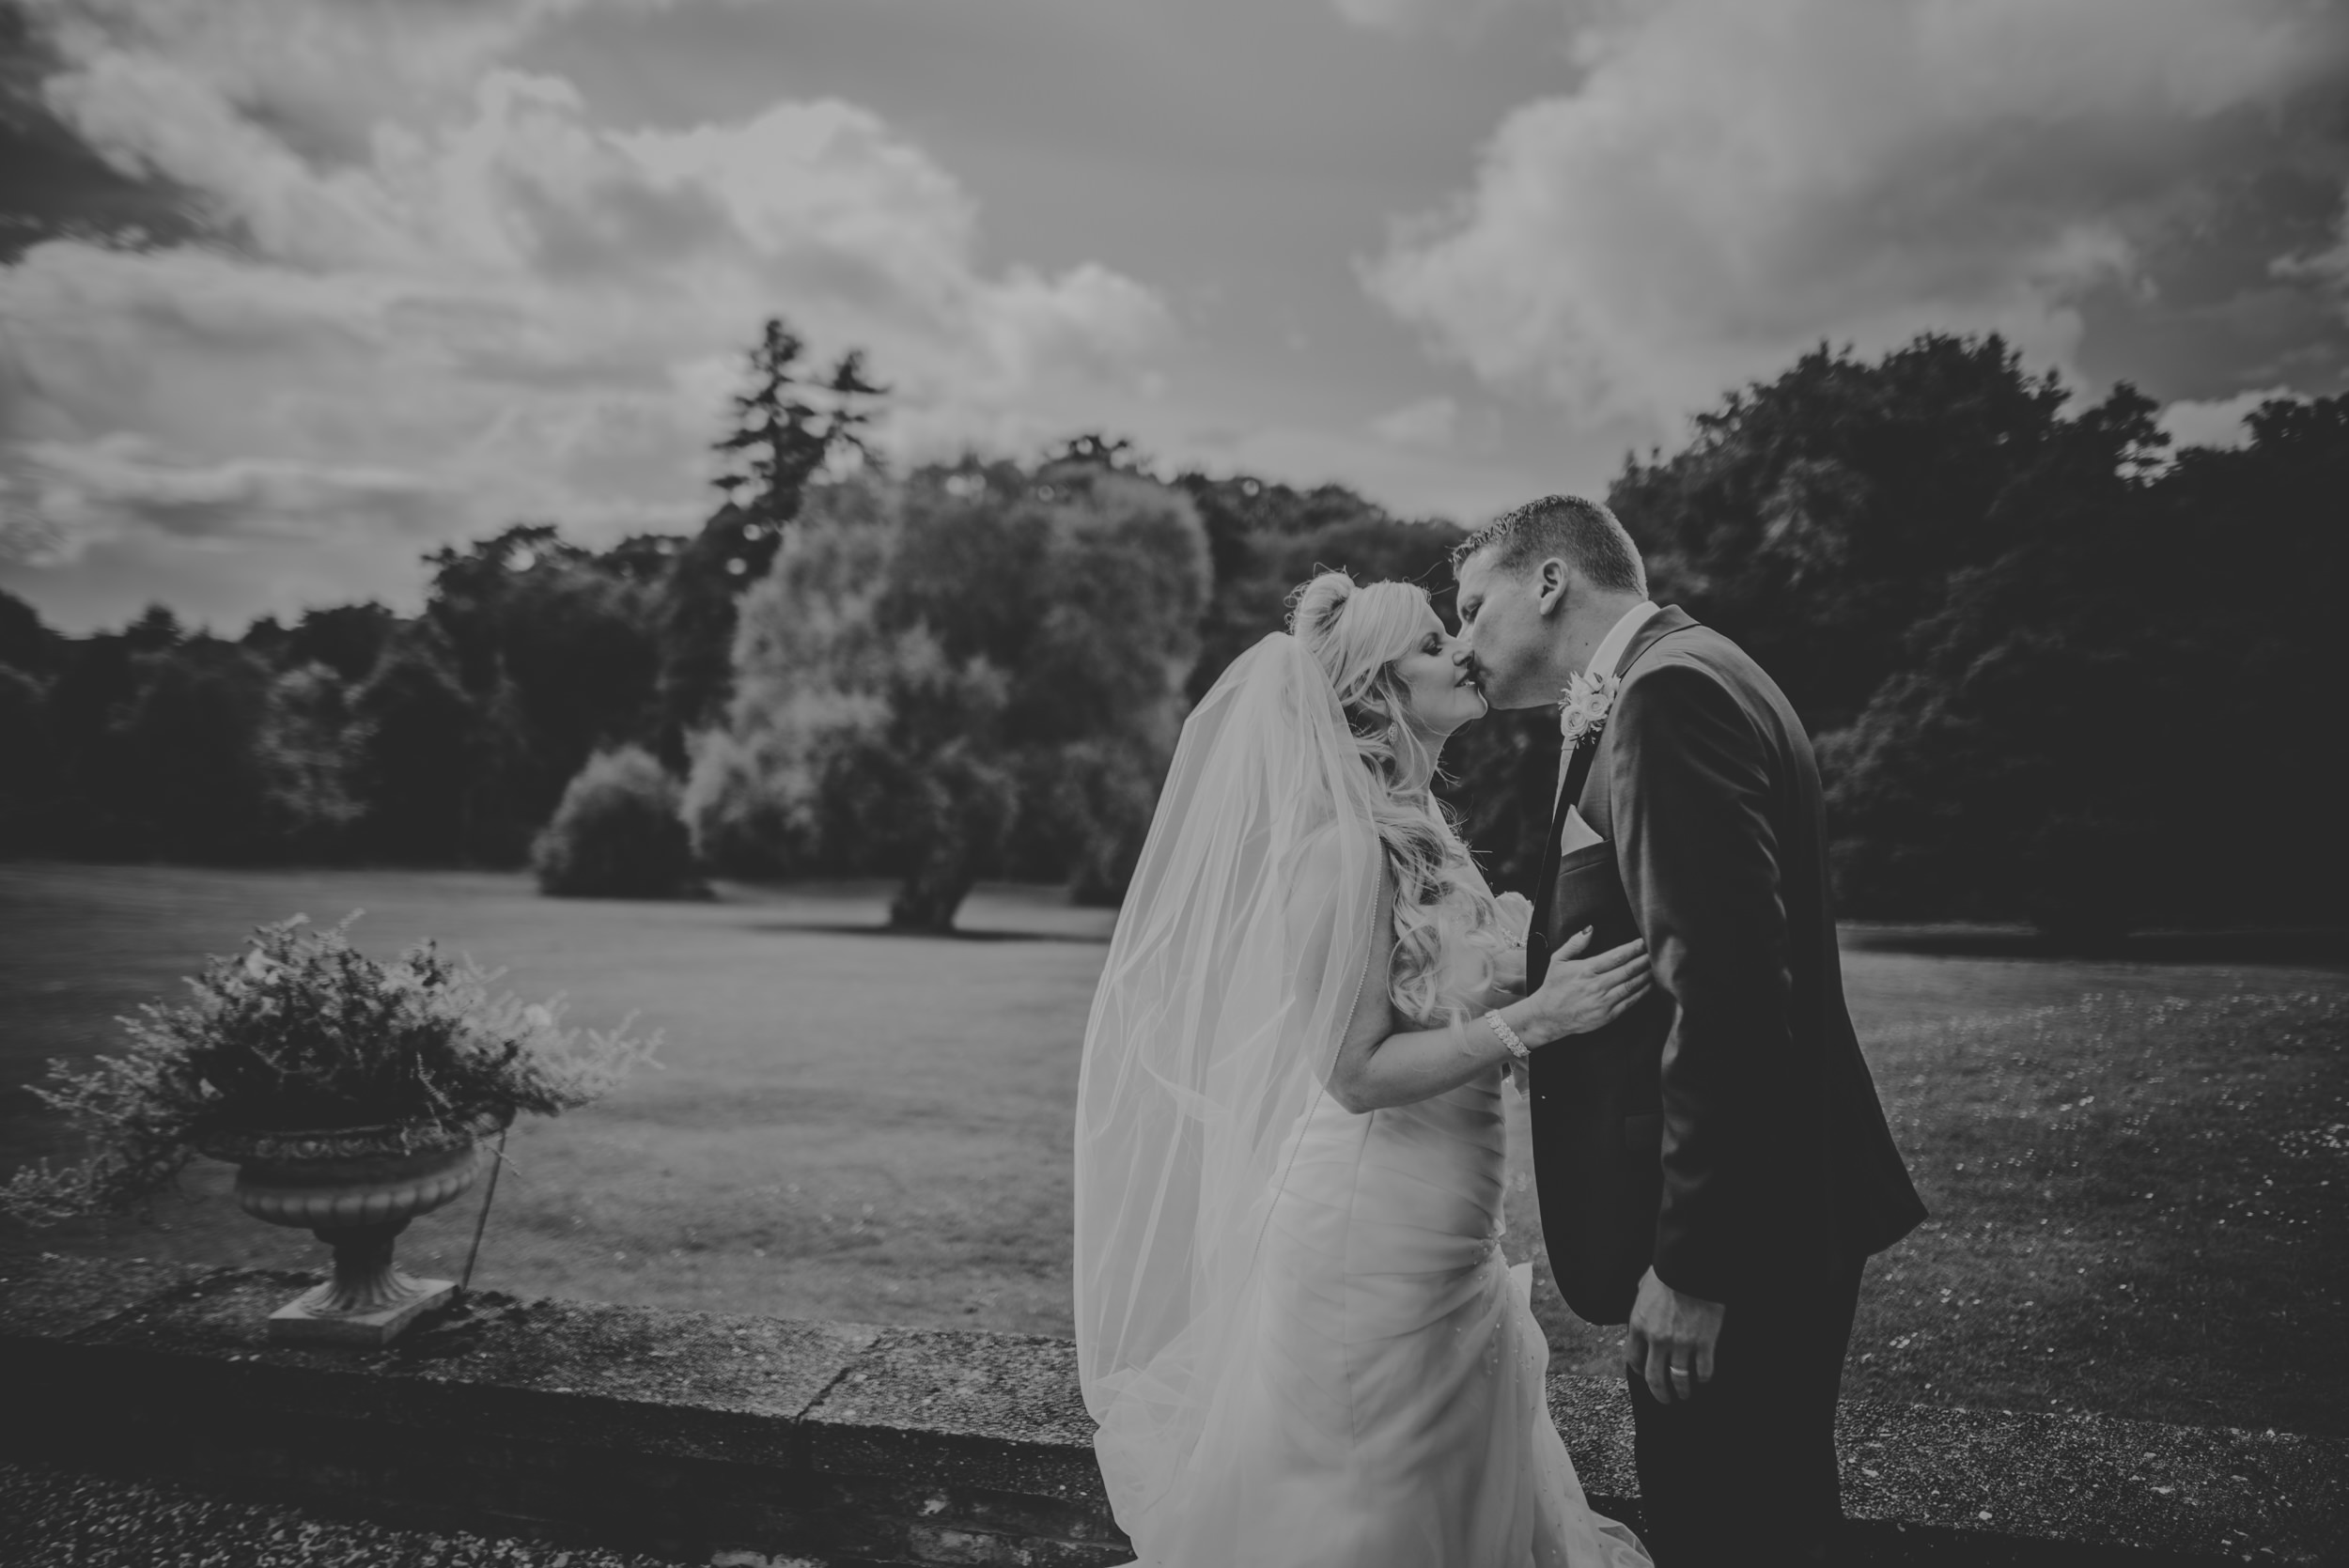 Trisha-and-Roger-wedding-The-Priory-Church-and-Chewton-Glen-Hotel-Christchurch-Manu-Mendoza-Wedding-Photography-307.jpg